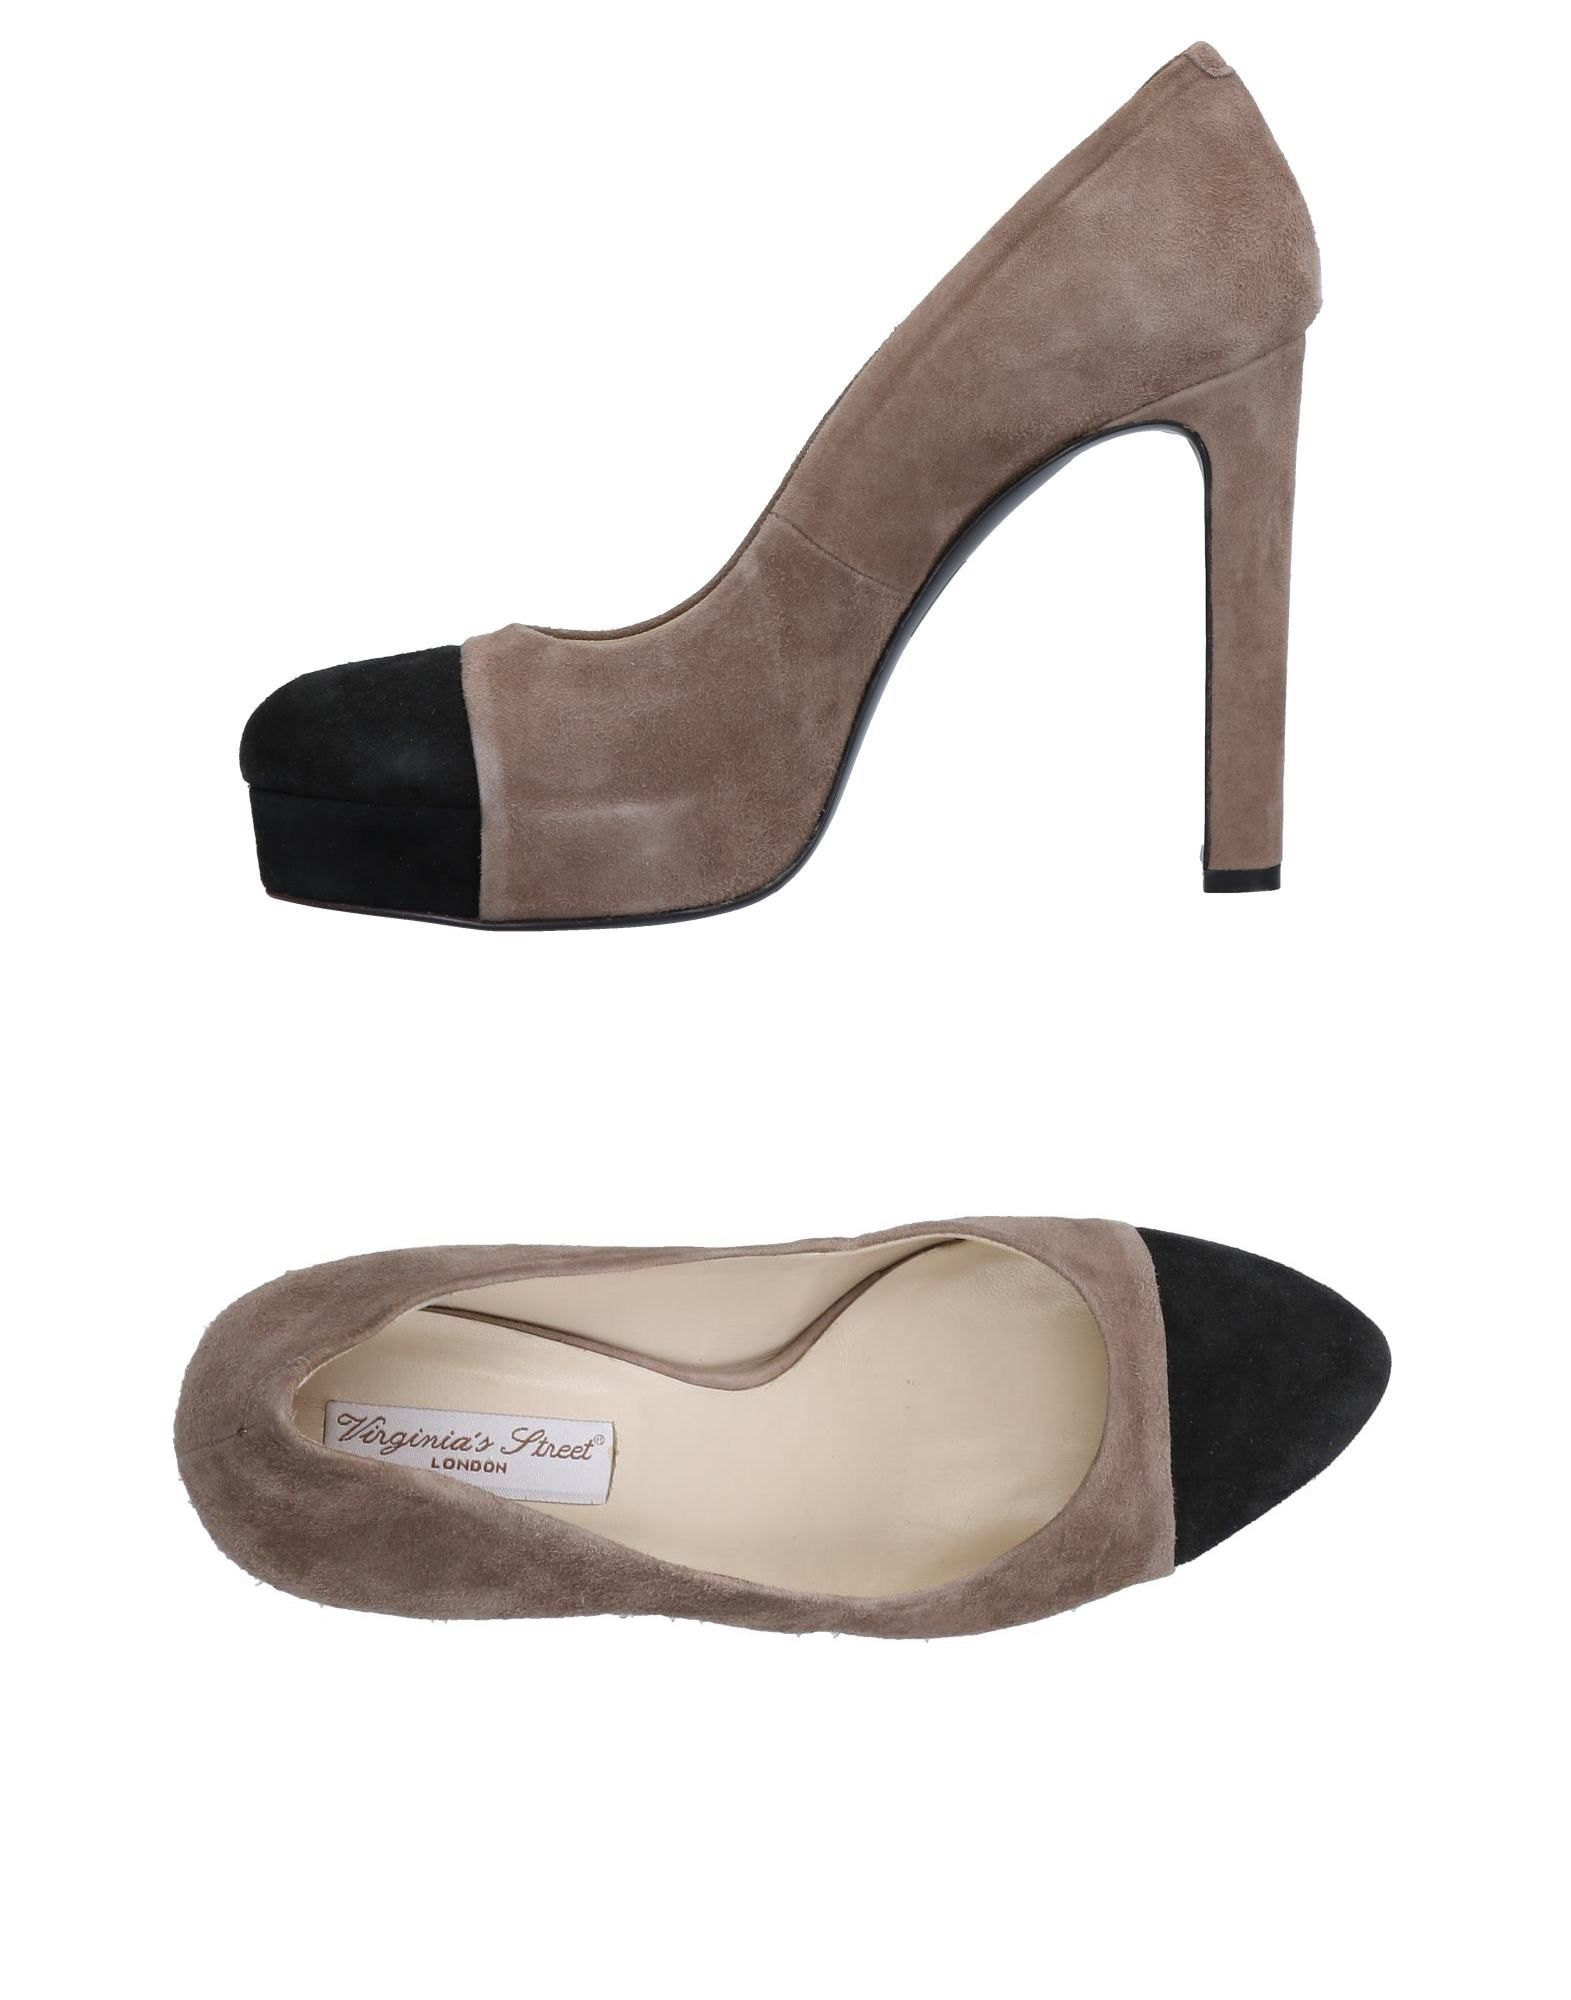 Virginia's Street Pumps Damen  11502775OV Gute Qualität beliebte Schuhe